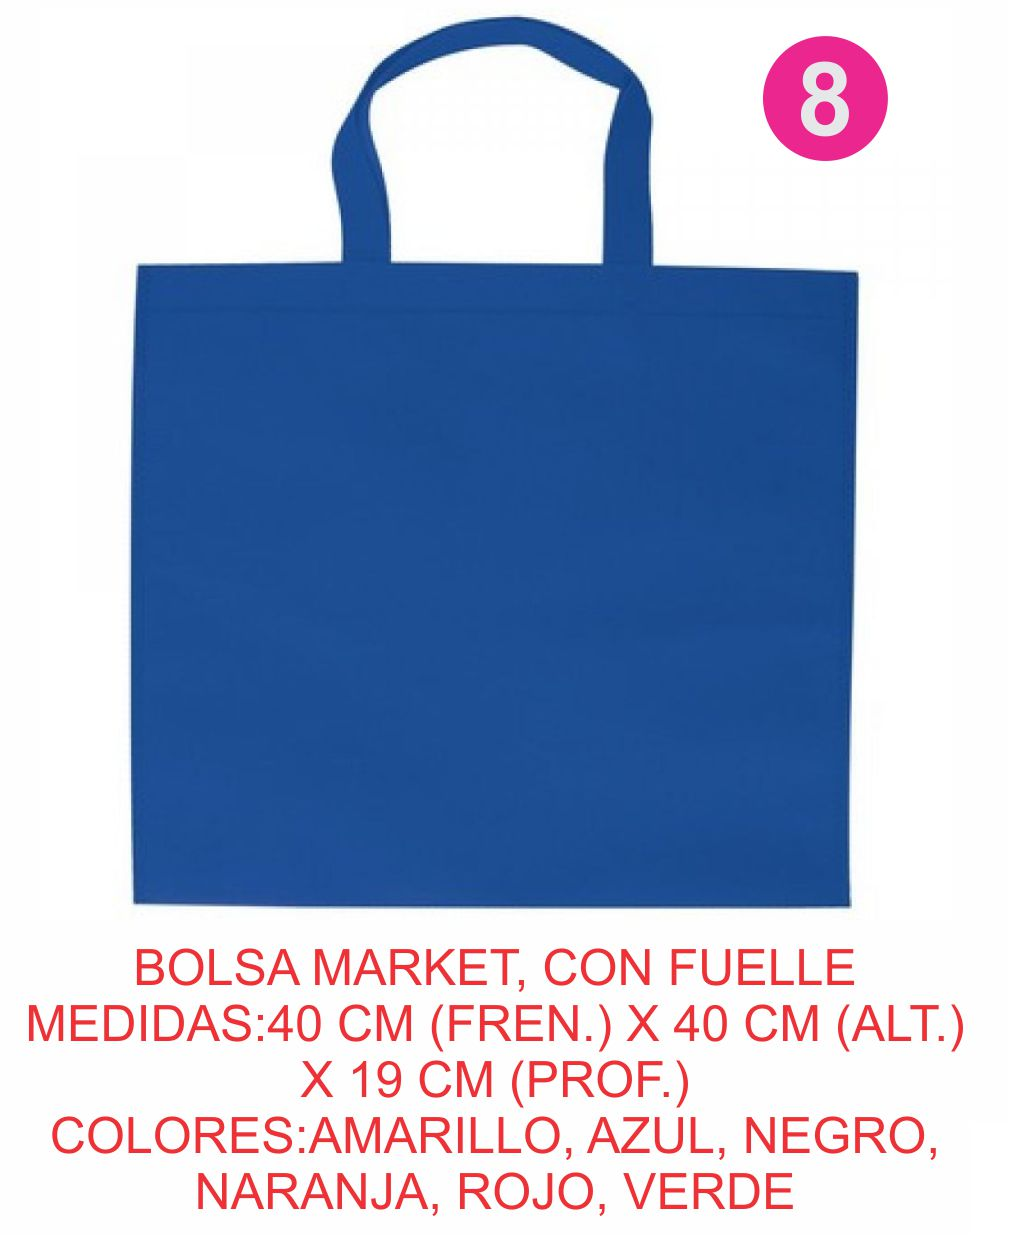 bolsa market